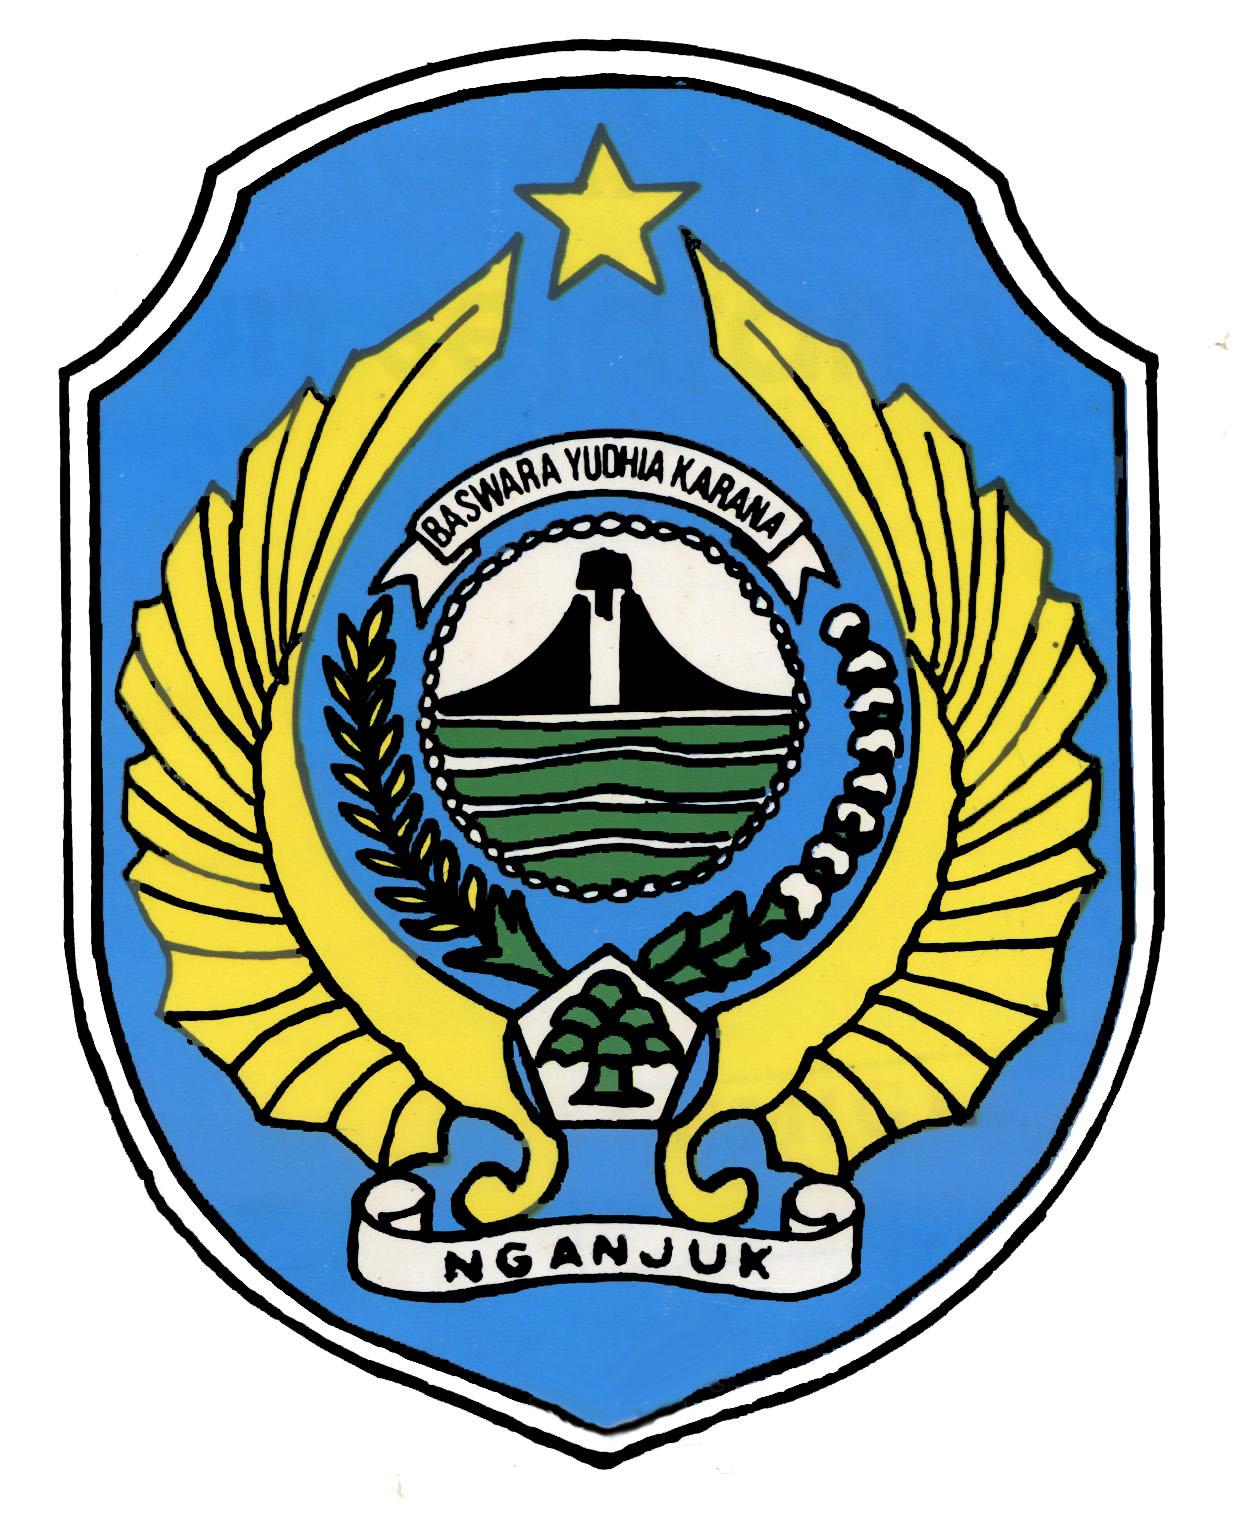 Hari Jadi Kabupaten Nganjuk Pusaka Jawatimuran Monumen Geriliya Jenderal Sudirman